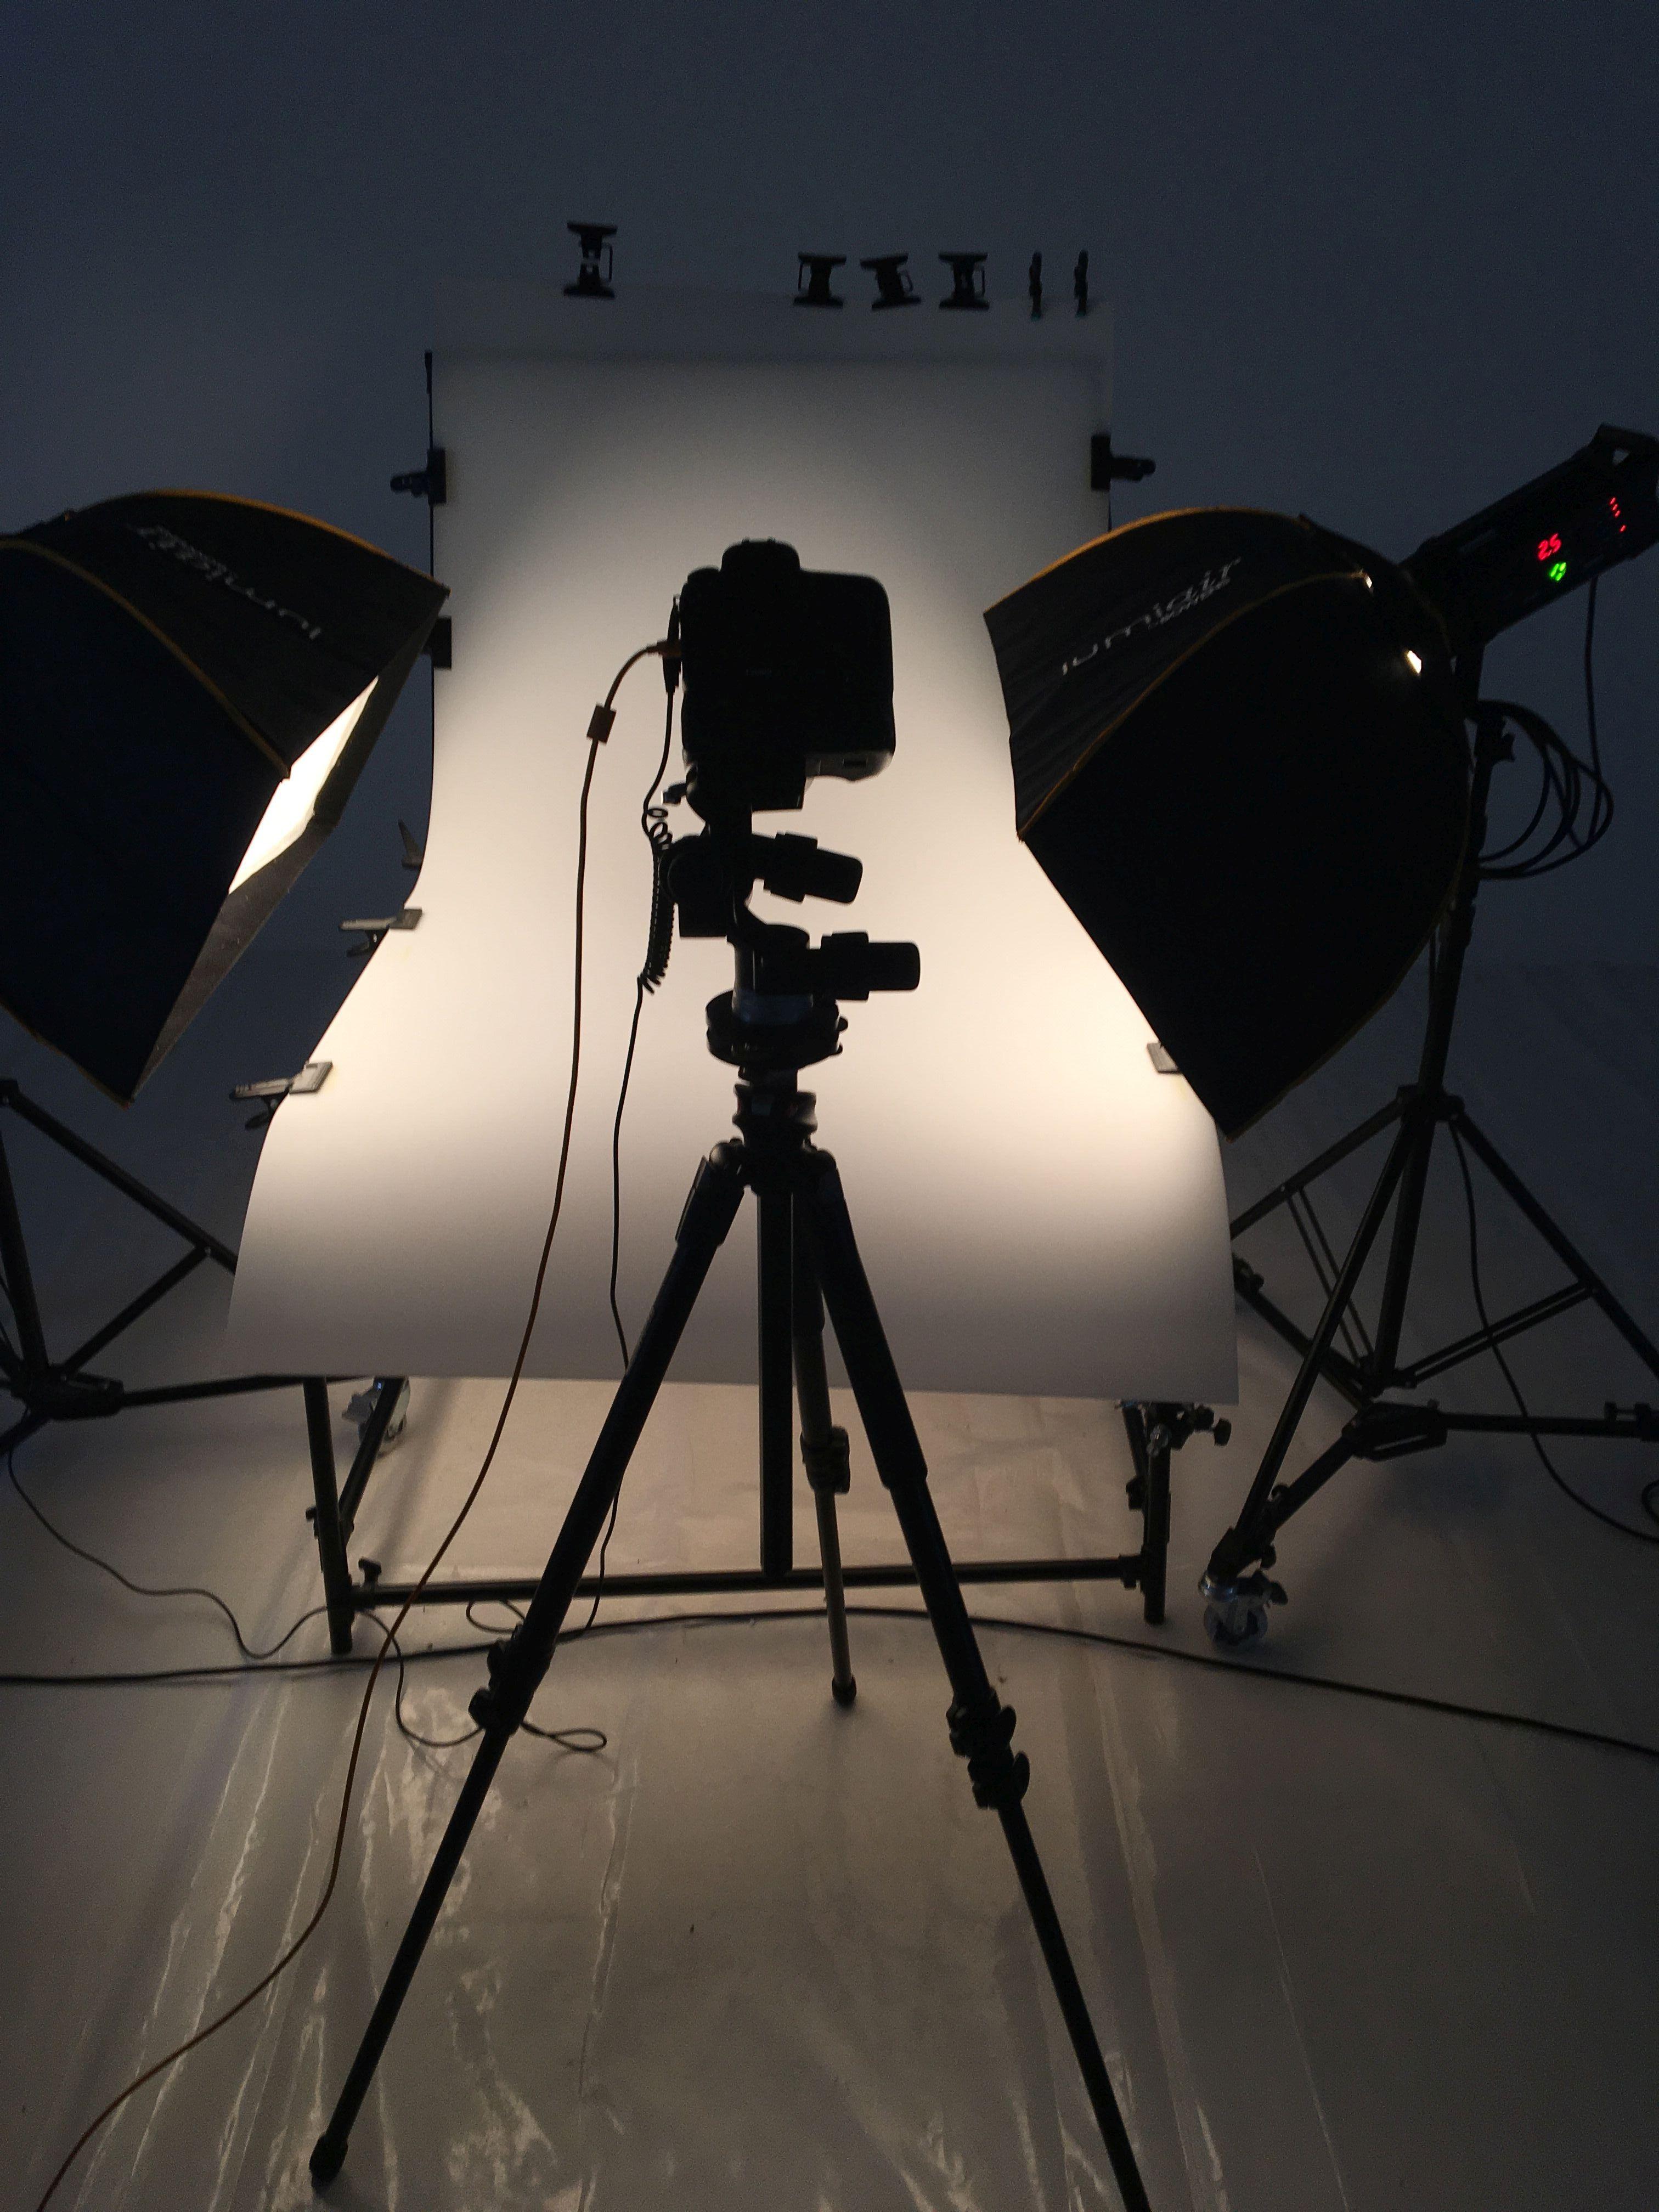 noleggio limbo cyclorama roma sala posa studio fotografico6